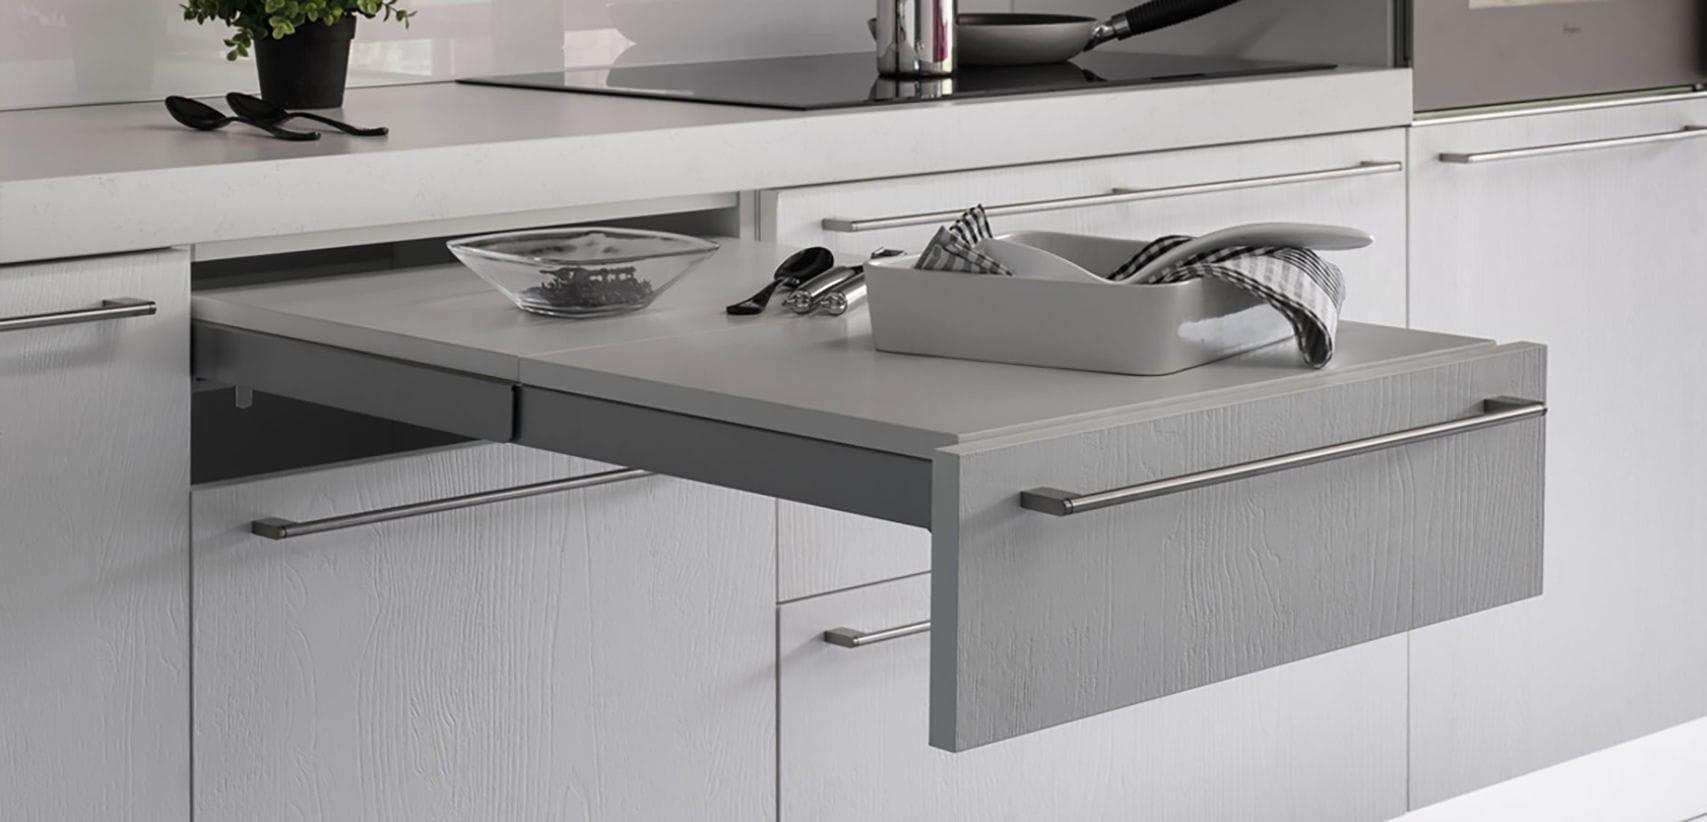 Laminat-Arbeitsplatte / Küchen - Zecchinon